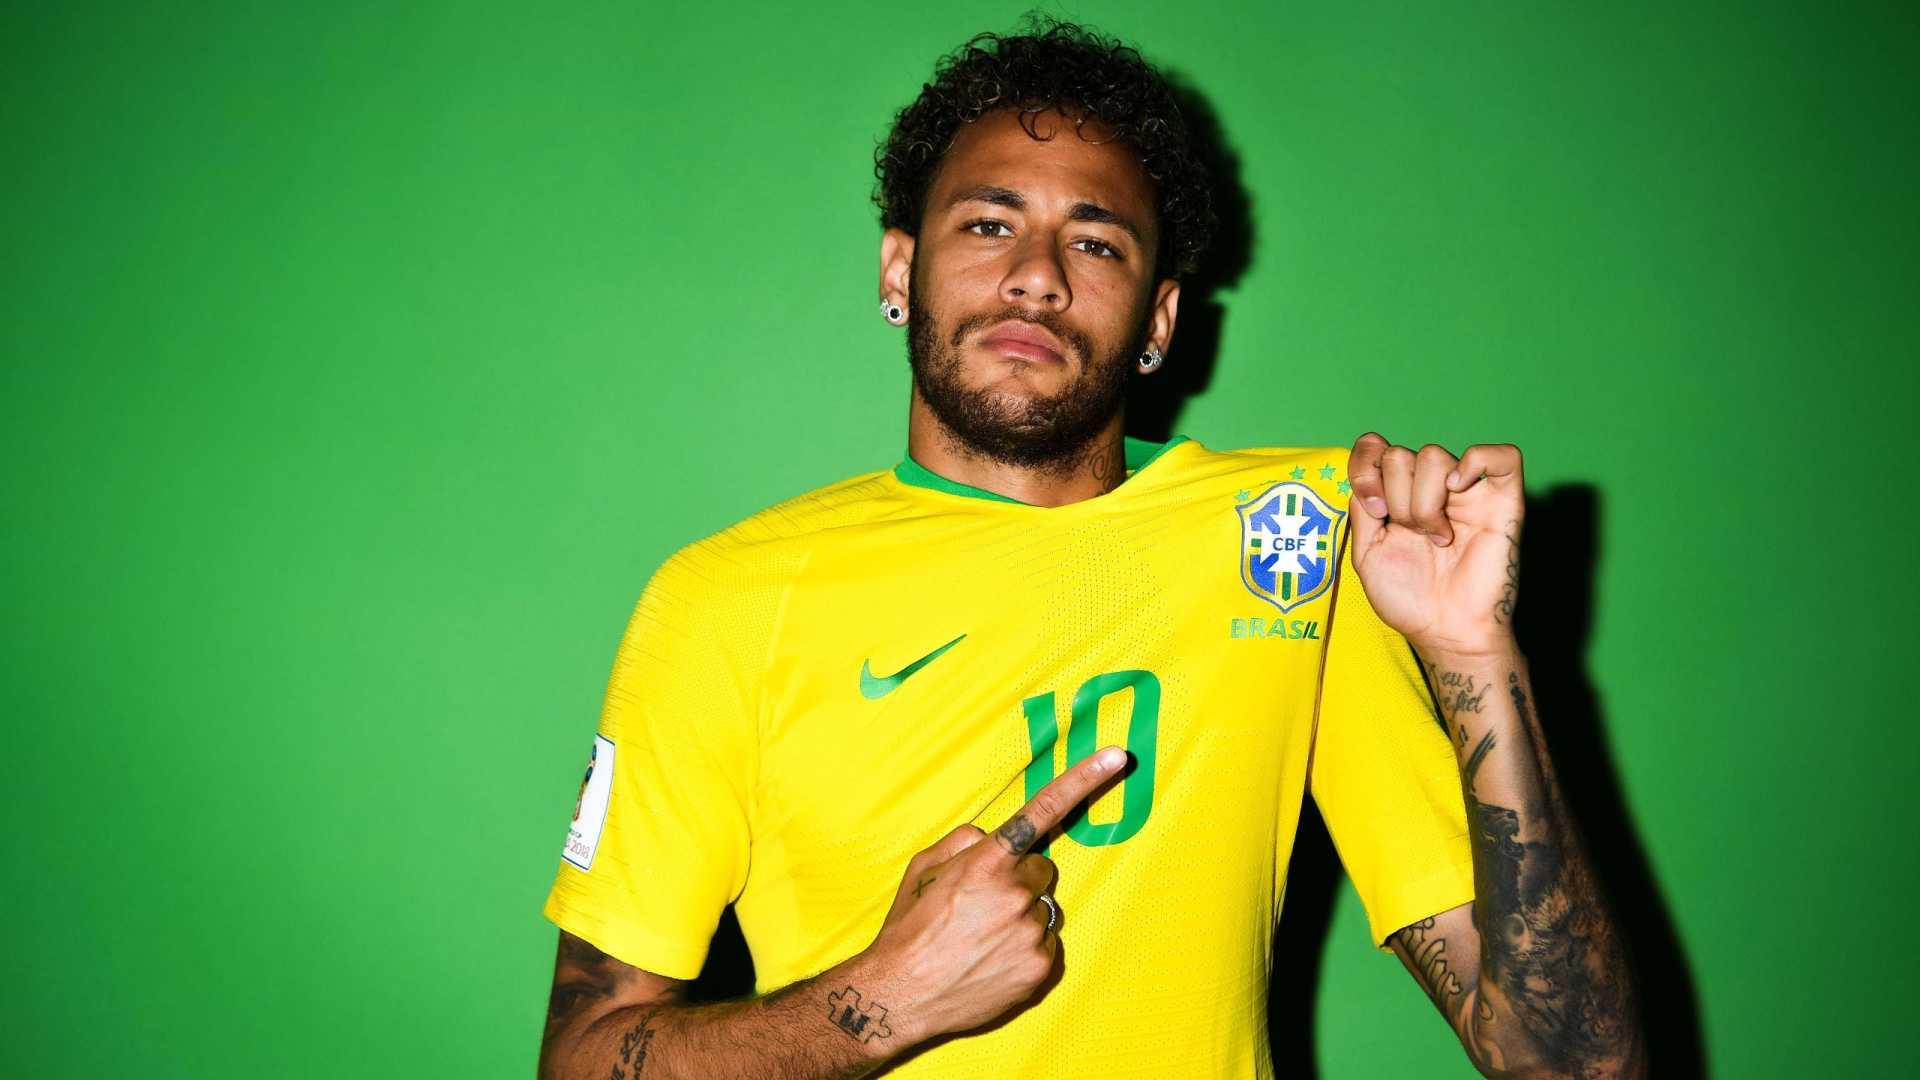 Jogadores posam para ensaio fotográfico oficial da Copa do Mundo; confira